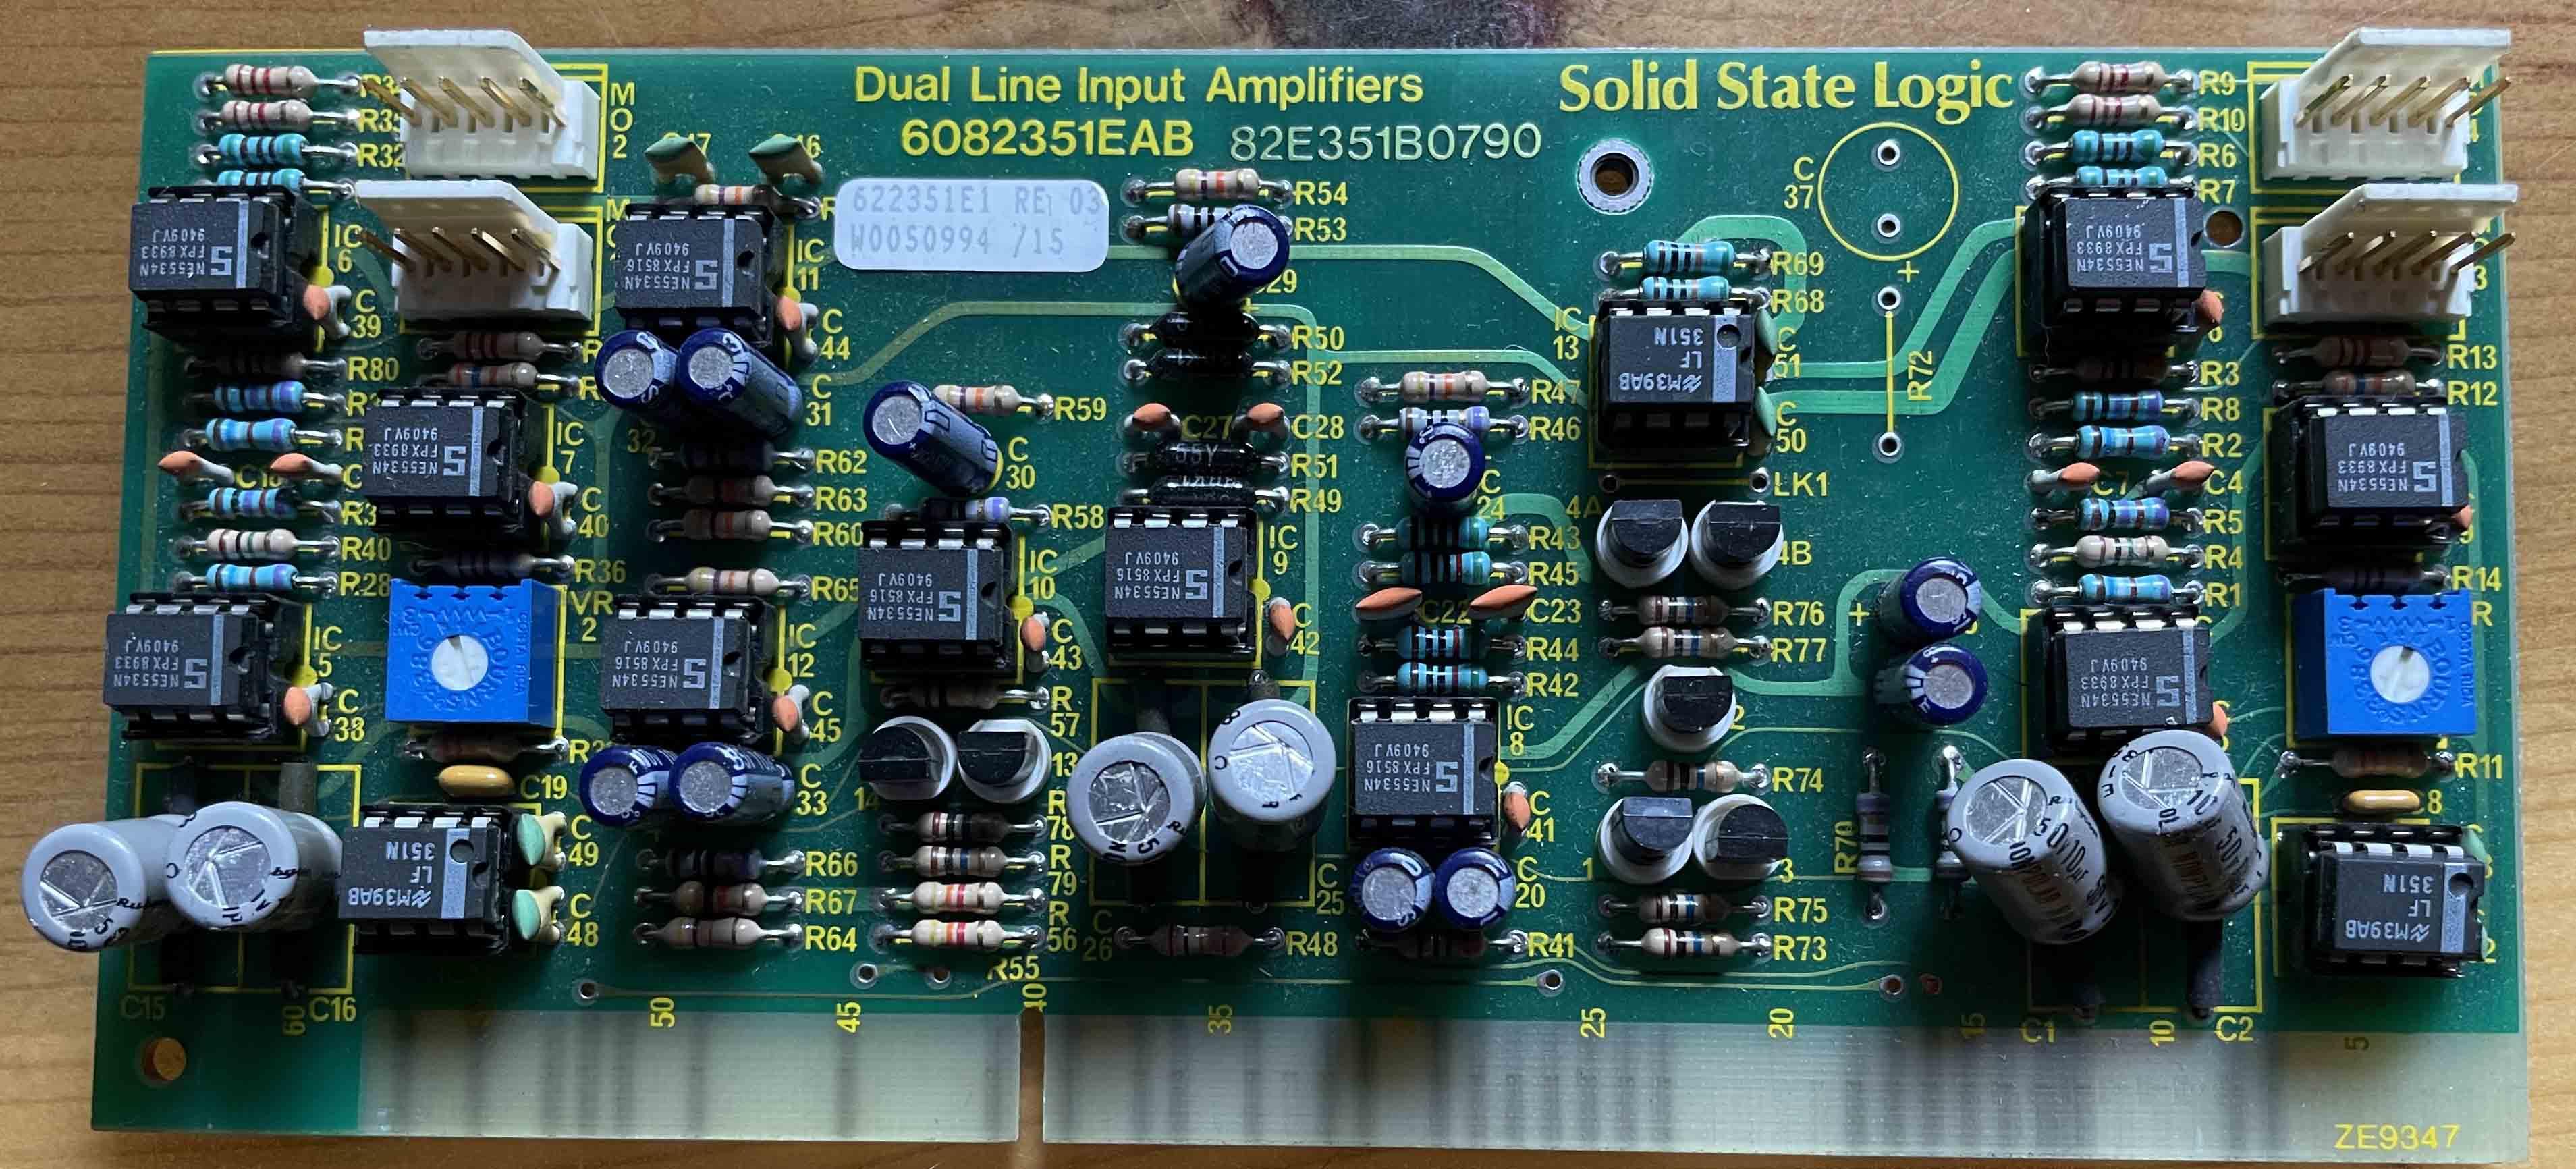 Dual Line Input Amplifer Card